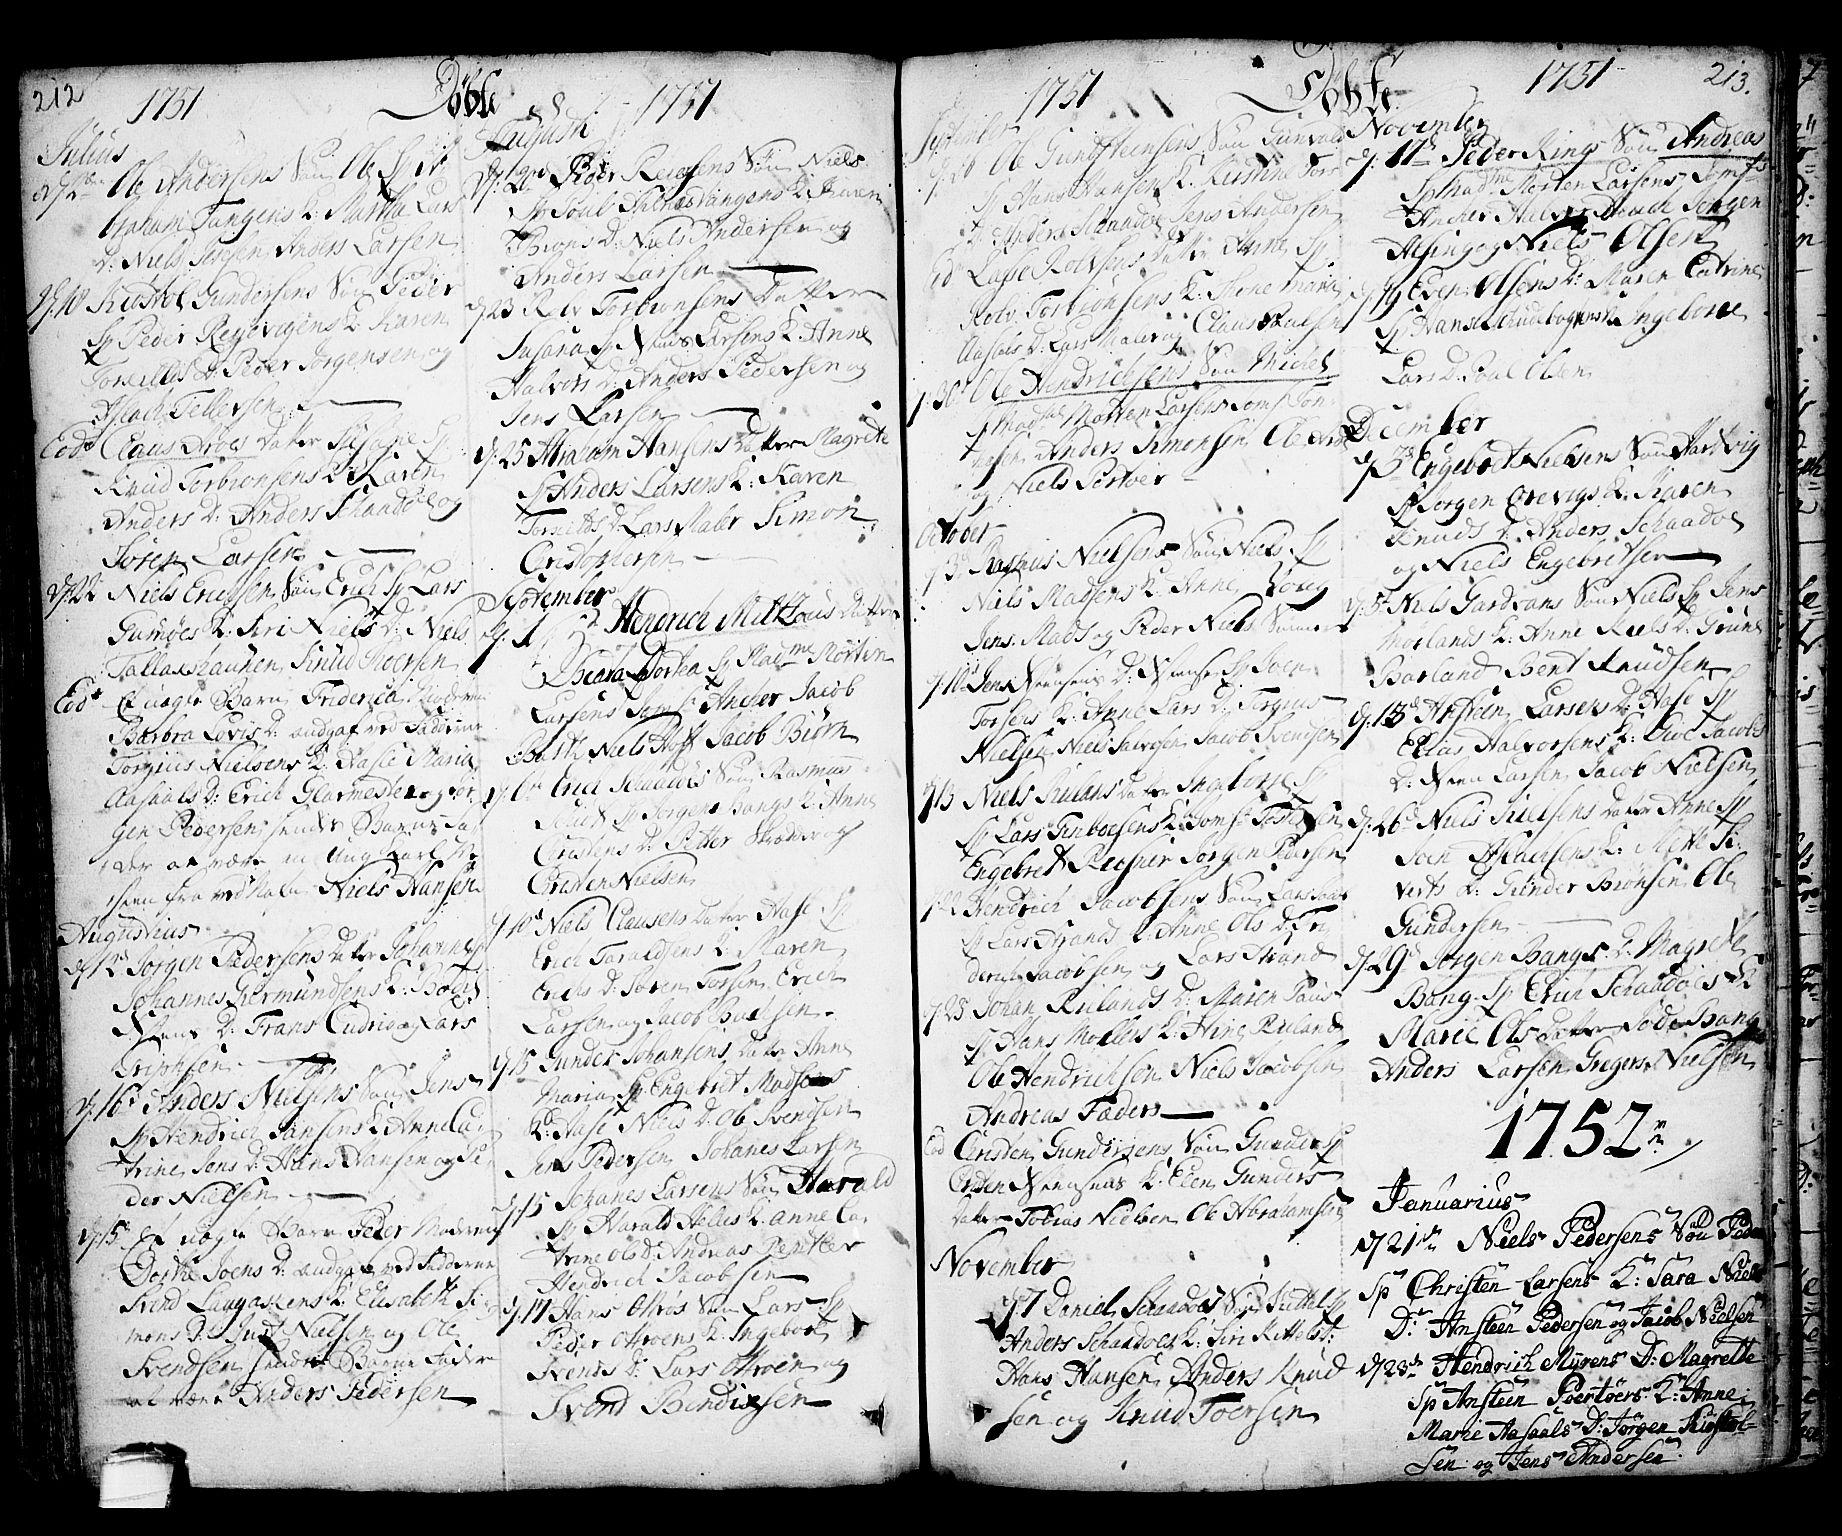 SAKO, Kragerø kirkebøker, F/Fa/L0001: Ministerialbok nr. 1, 1702-1766, s. 212-213